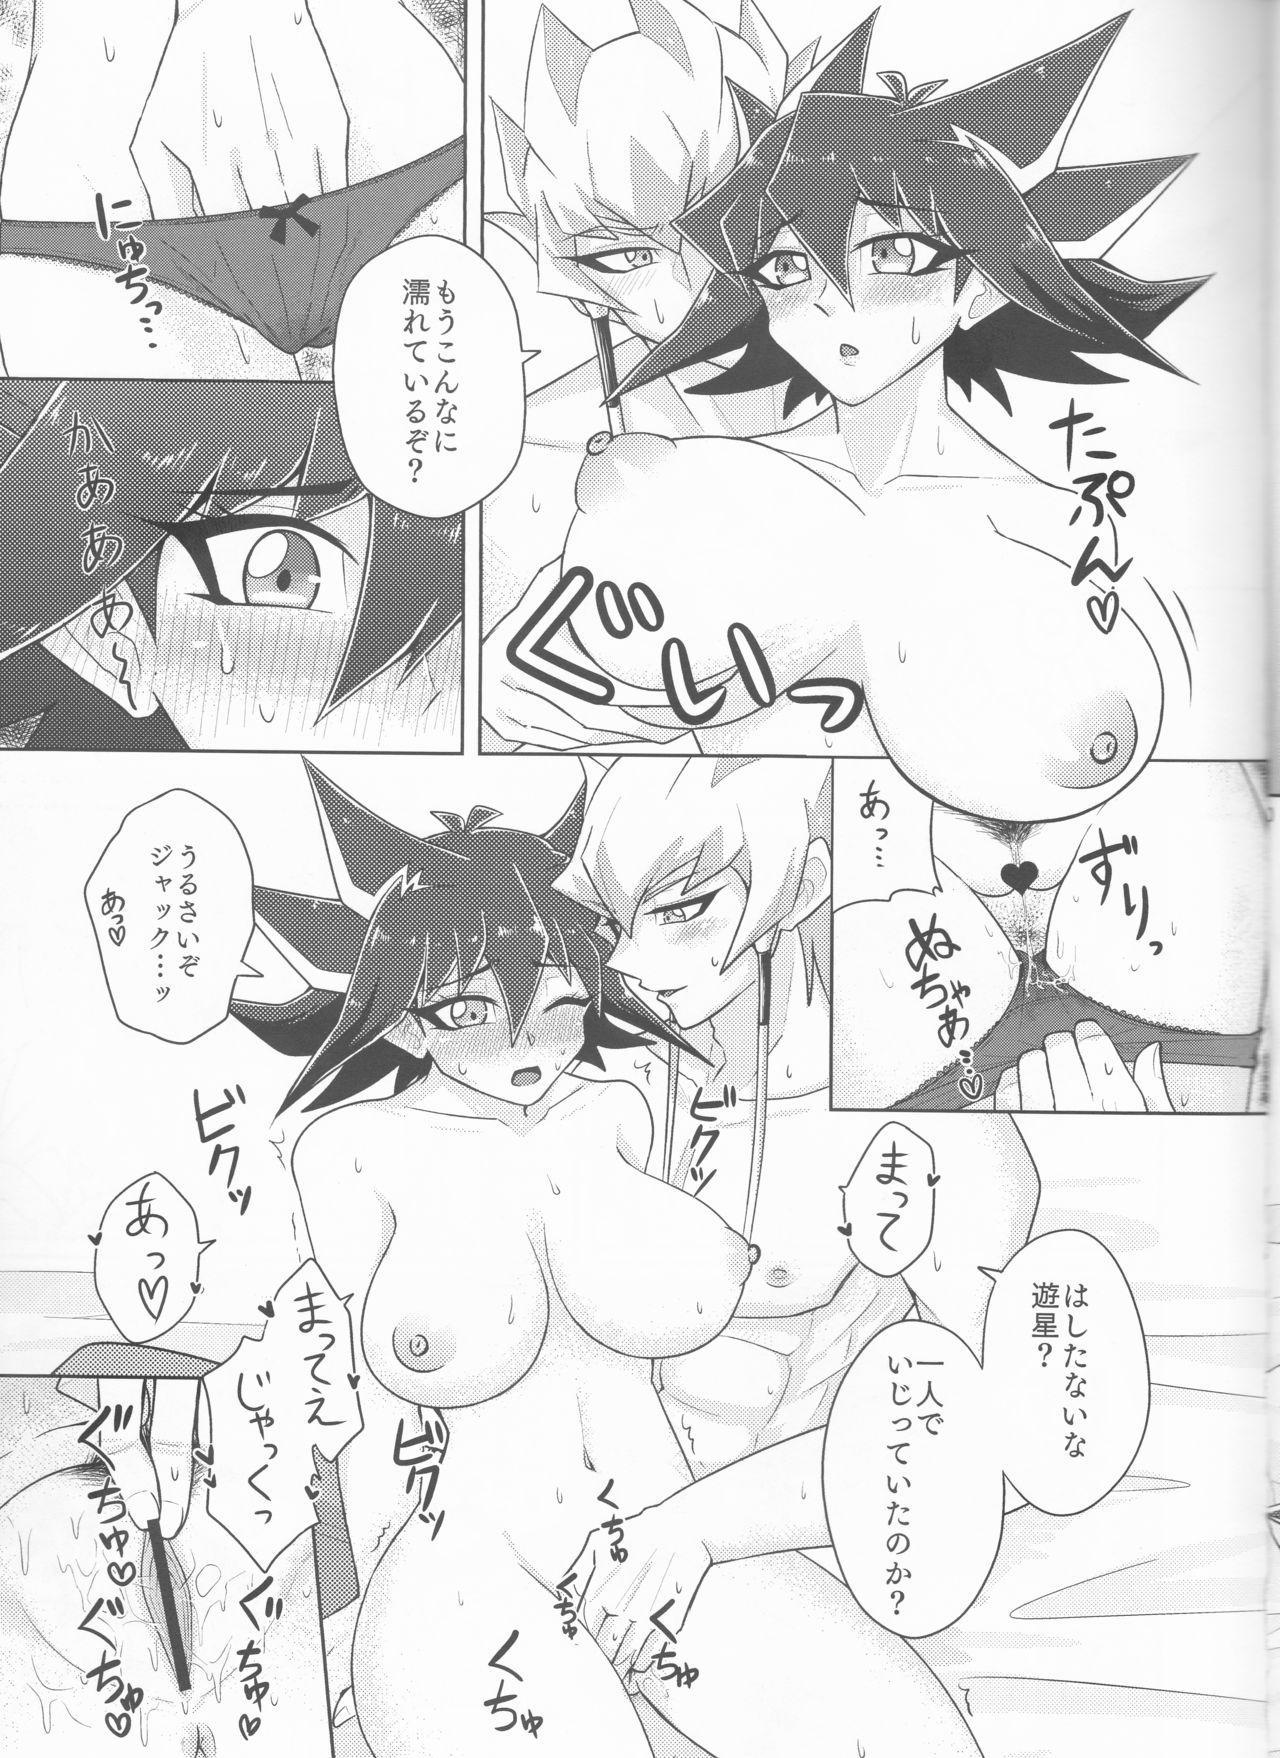 (Chou Ore no Turn 2019) [KINOPOTION (Take Nameko)] King (Mi) to Yusei-chan ♀ (Yu-Gi-Oh! 5D's) 10